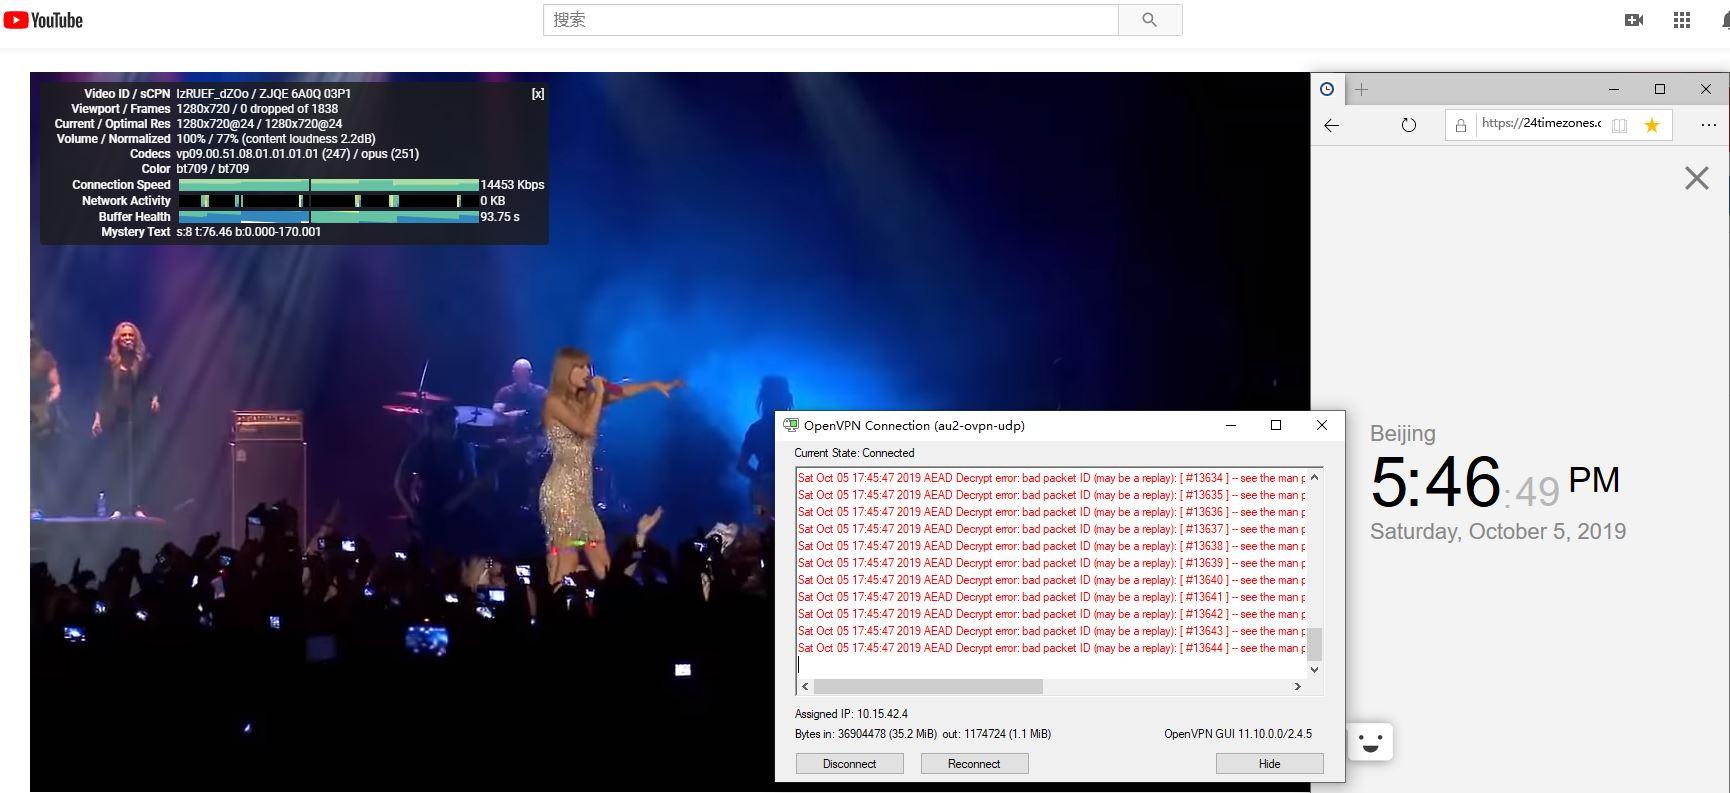 Windows IvacyVPN AU2-UDP 中国VPN翻墙 科学上网 YouTube测试-20191005